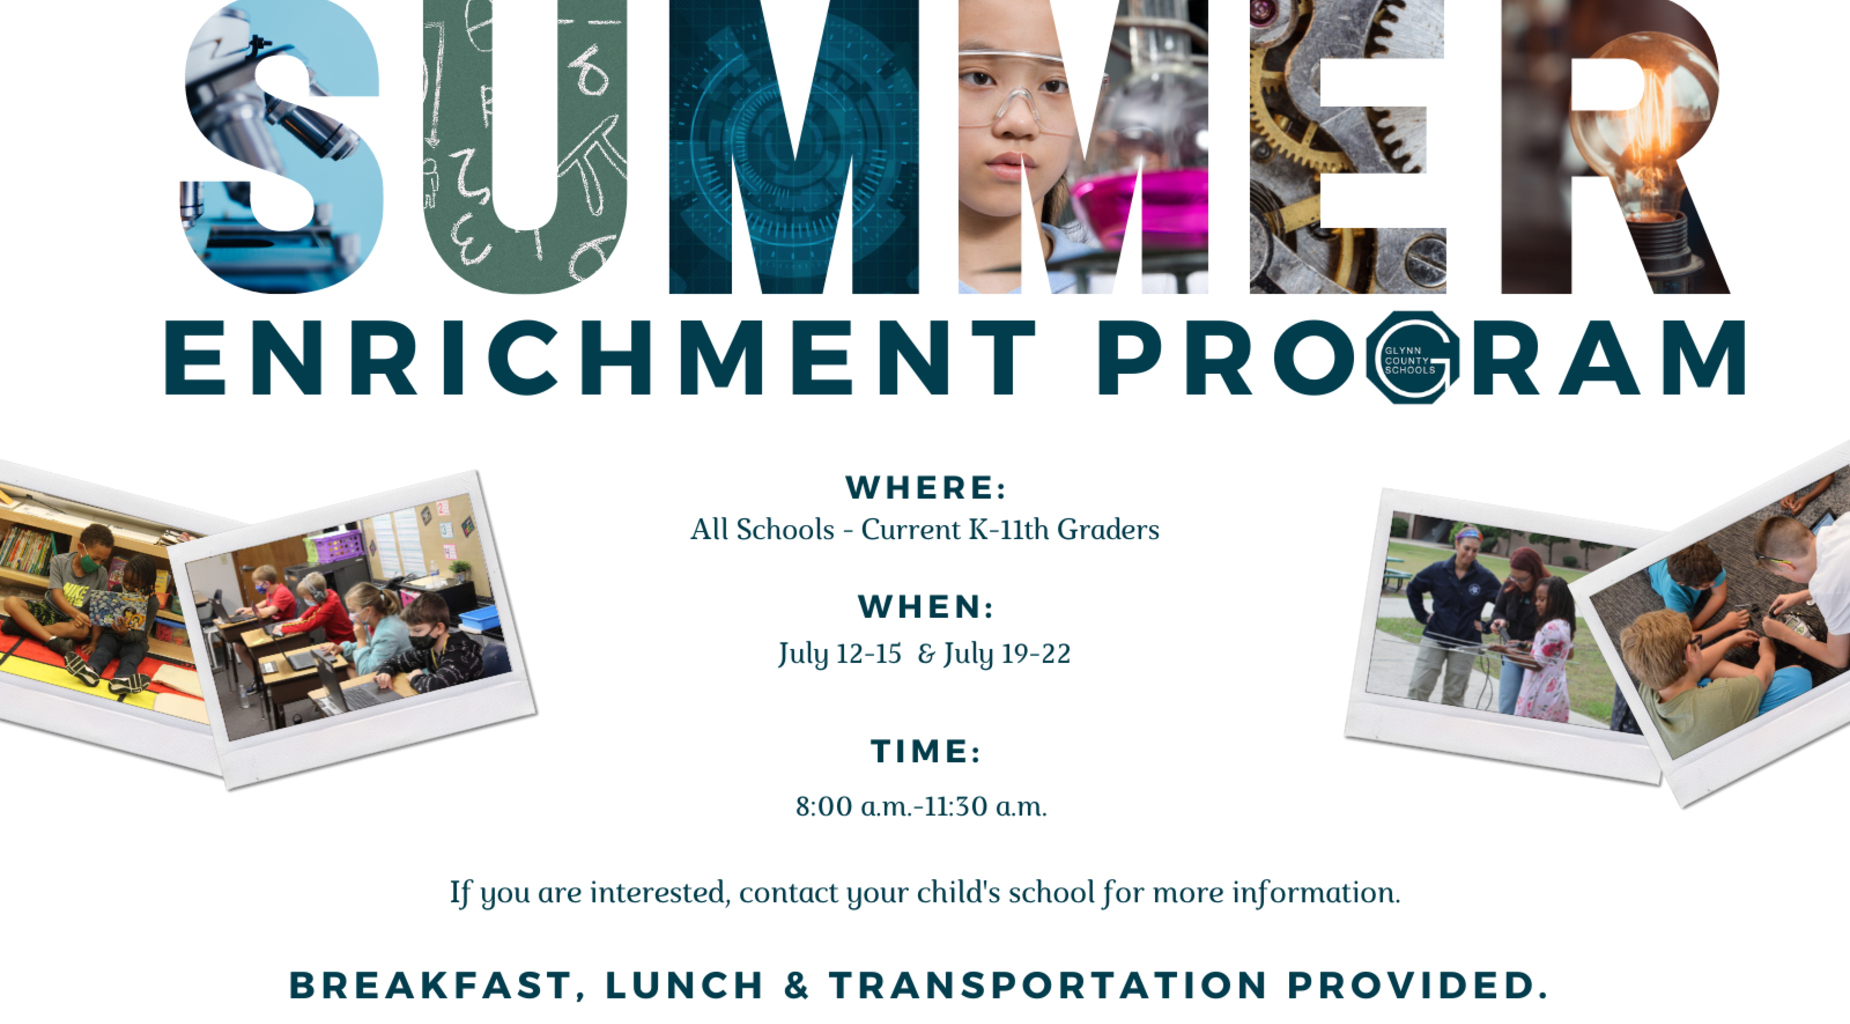 Summer Enrichment Program Graphic